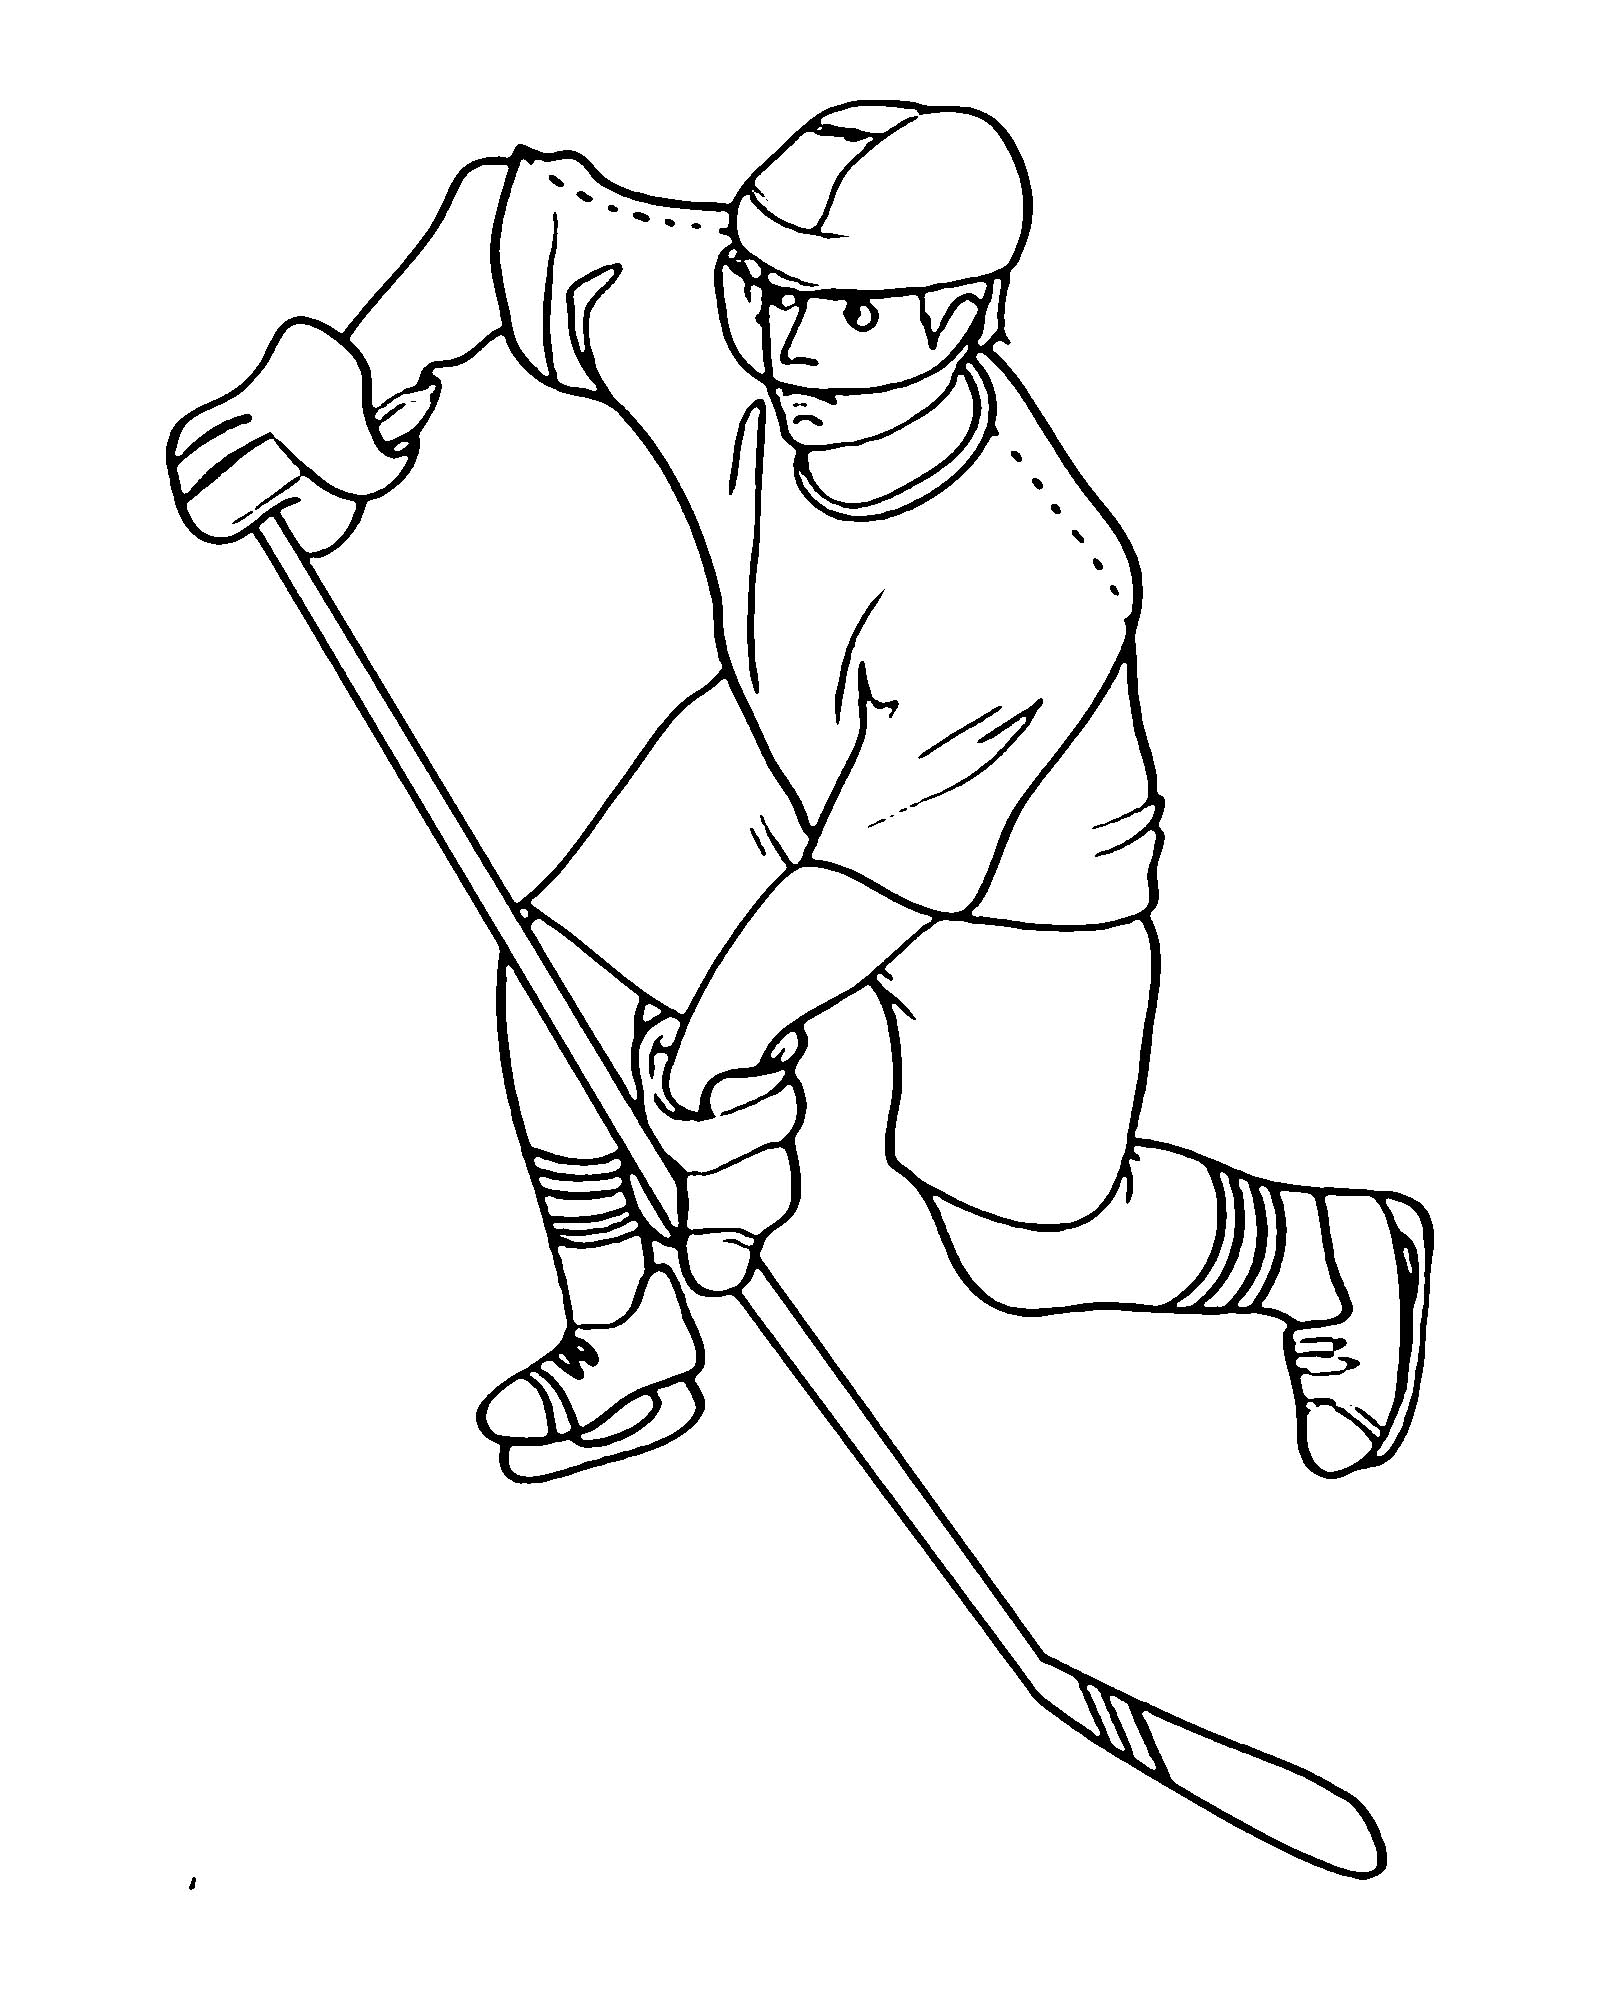 рисунки хоккеиста карандашом ещё